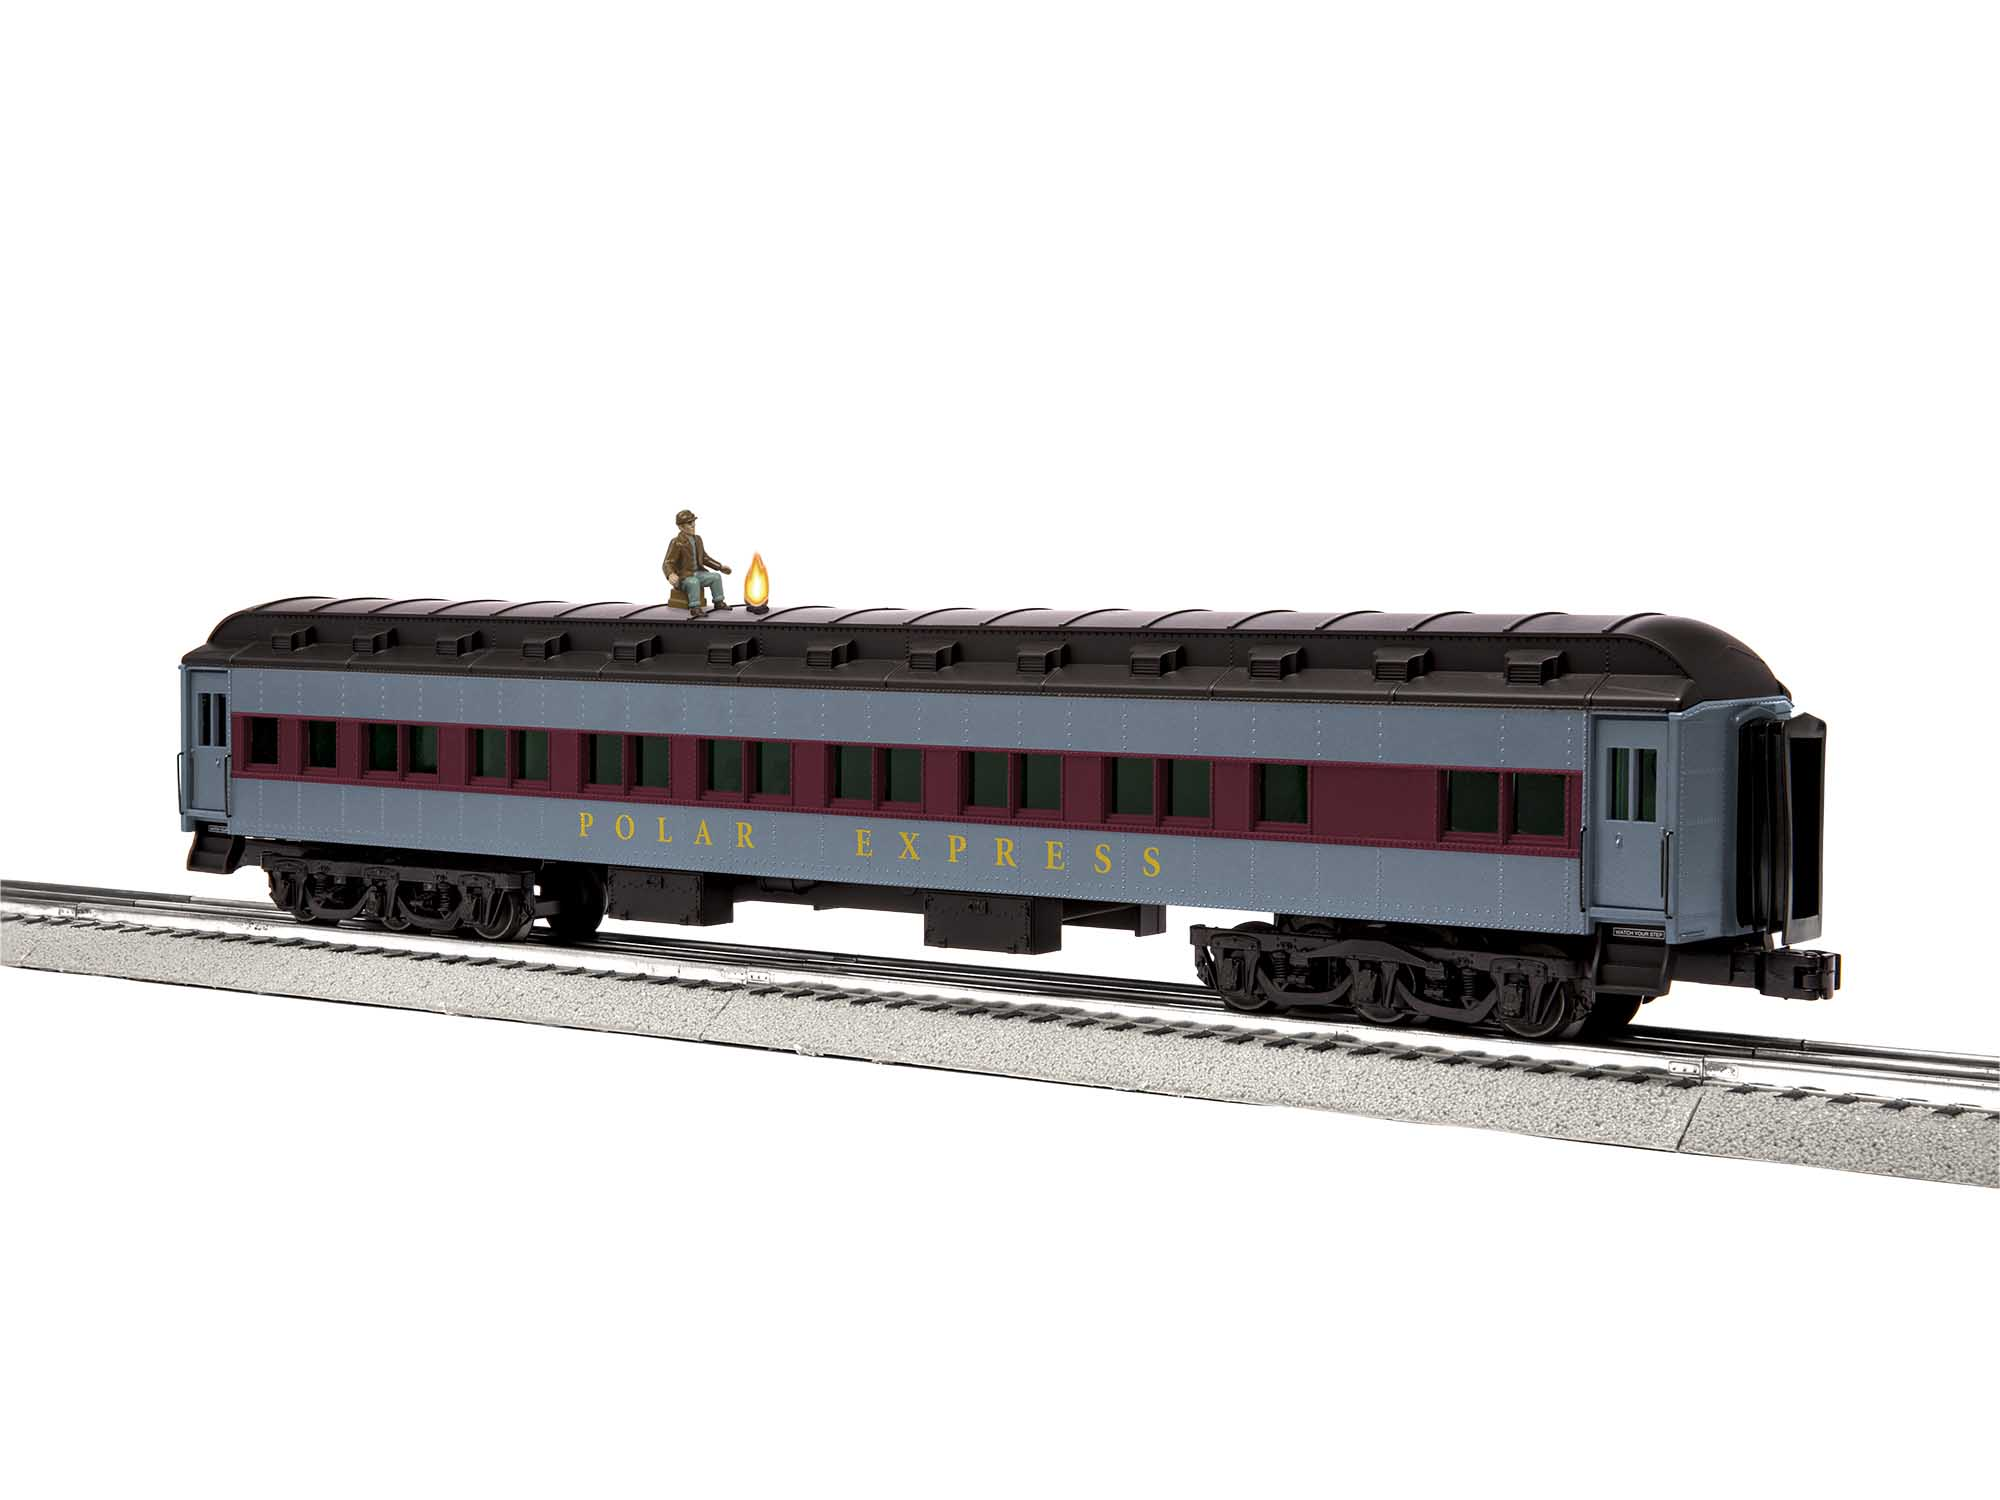 Lionel 2027470 O Passenger The Polar Express Hobo Black Roof